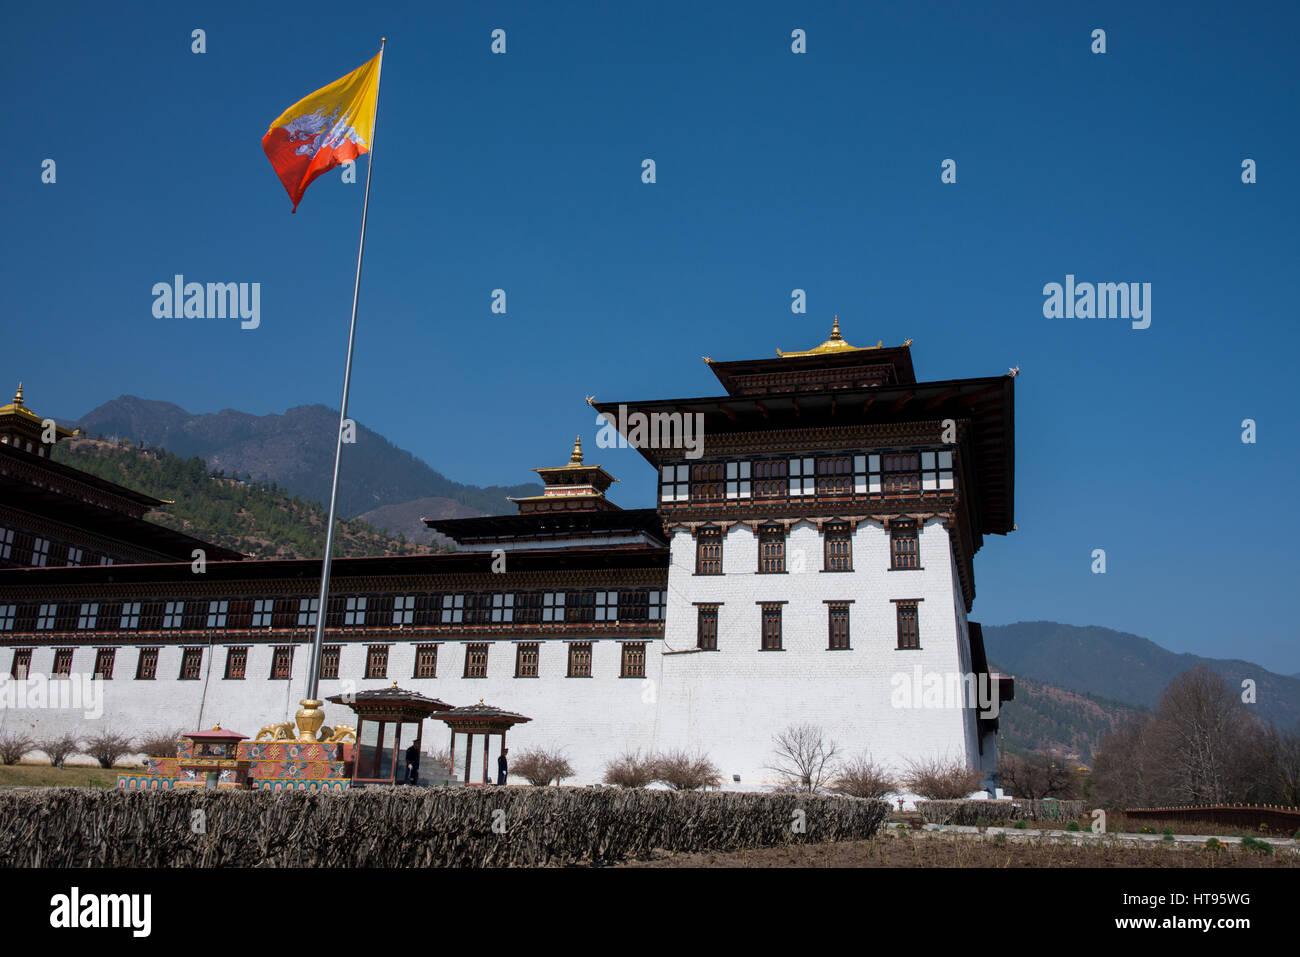 Le Bhoutan, Thimphu. Tashichhoedzong (aka Tashichho Dzong) monastère bouddhiste historique et de la forteresse Photo Stock